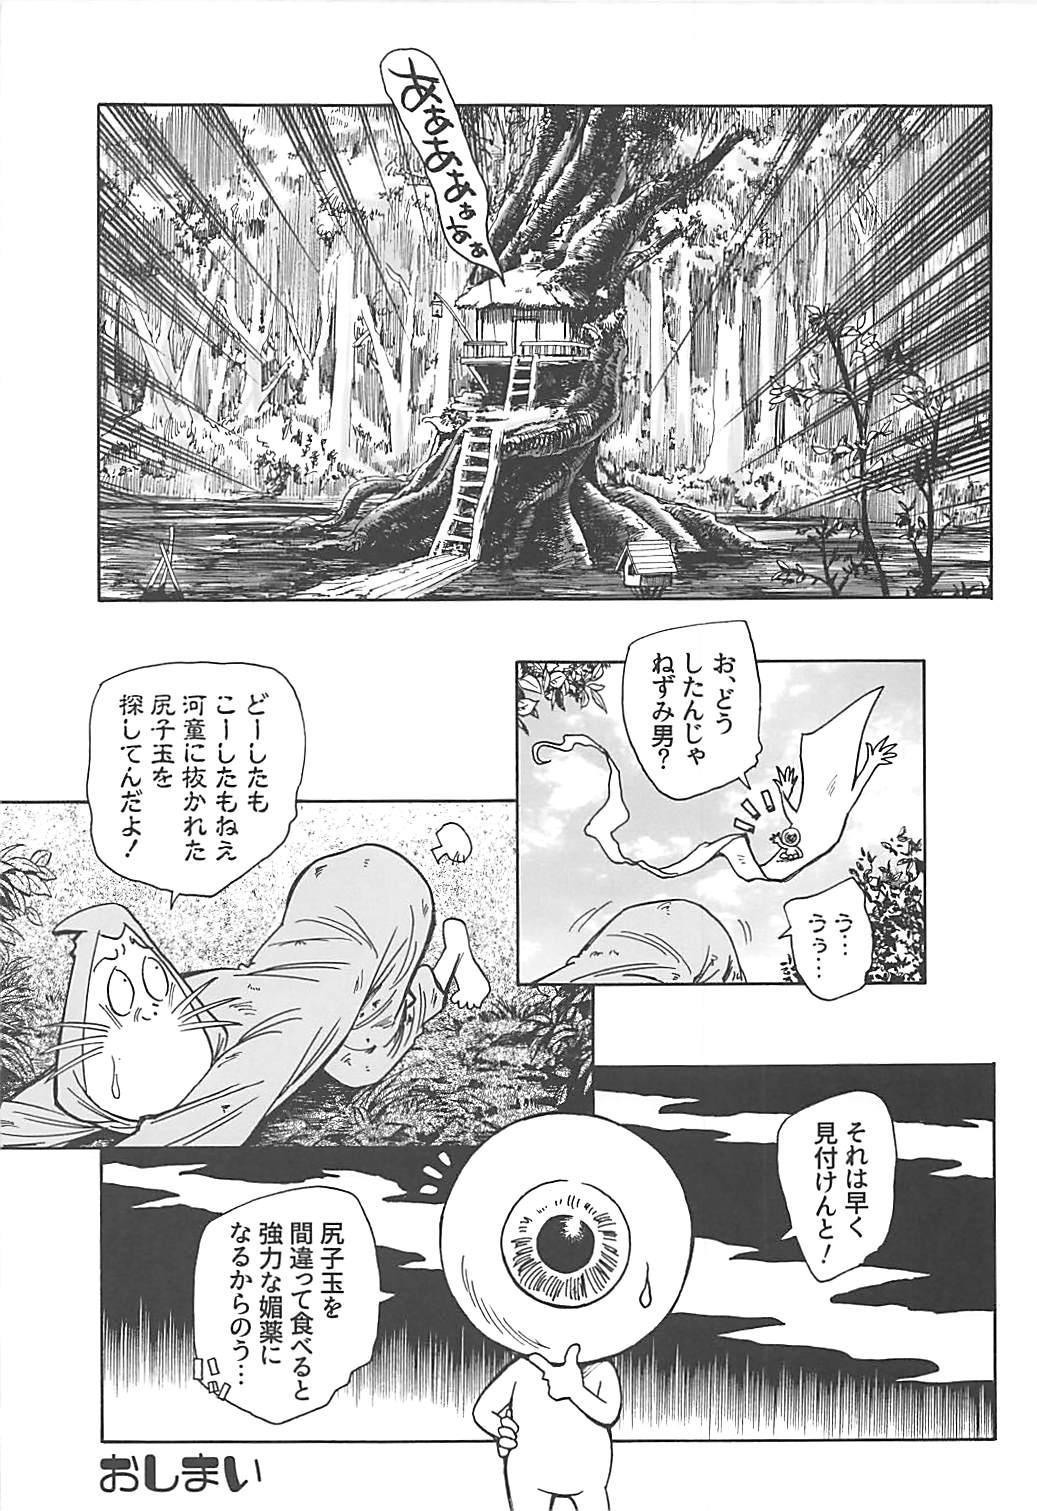 Neko Musume no Ii Kimochi - Cat Girl's Ecstasy 23